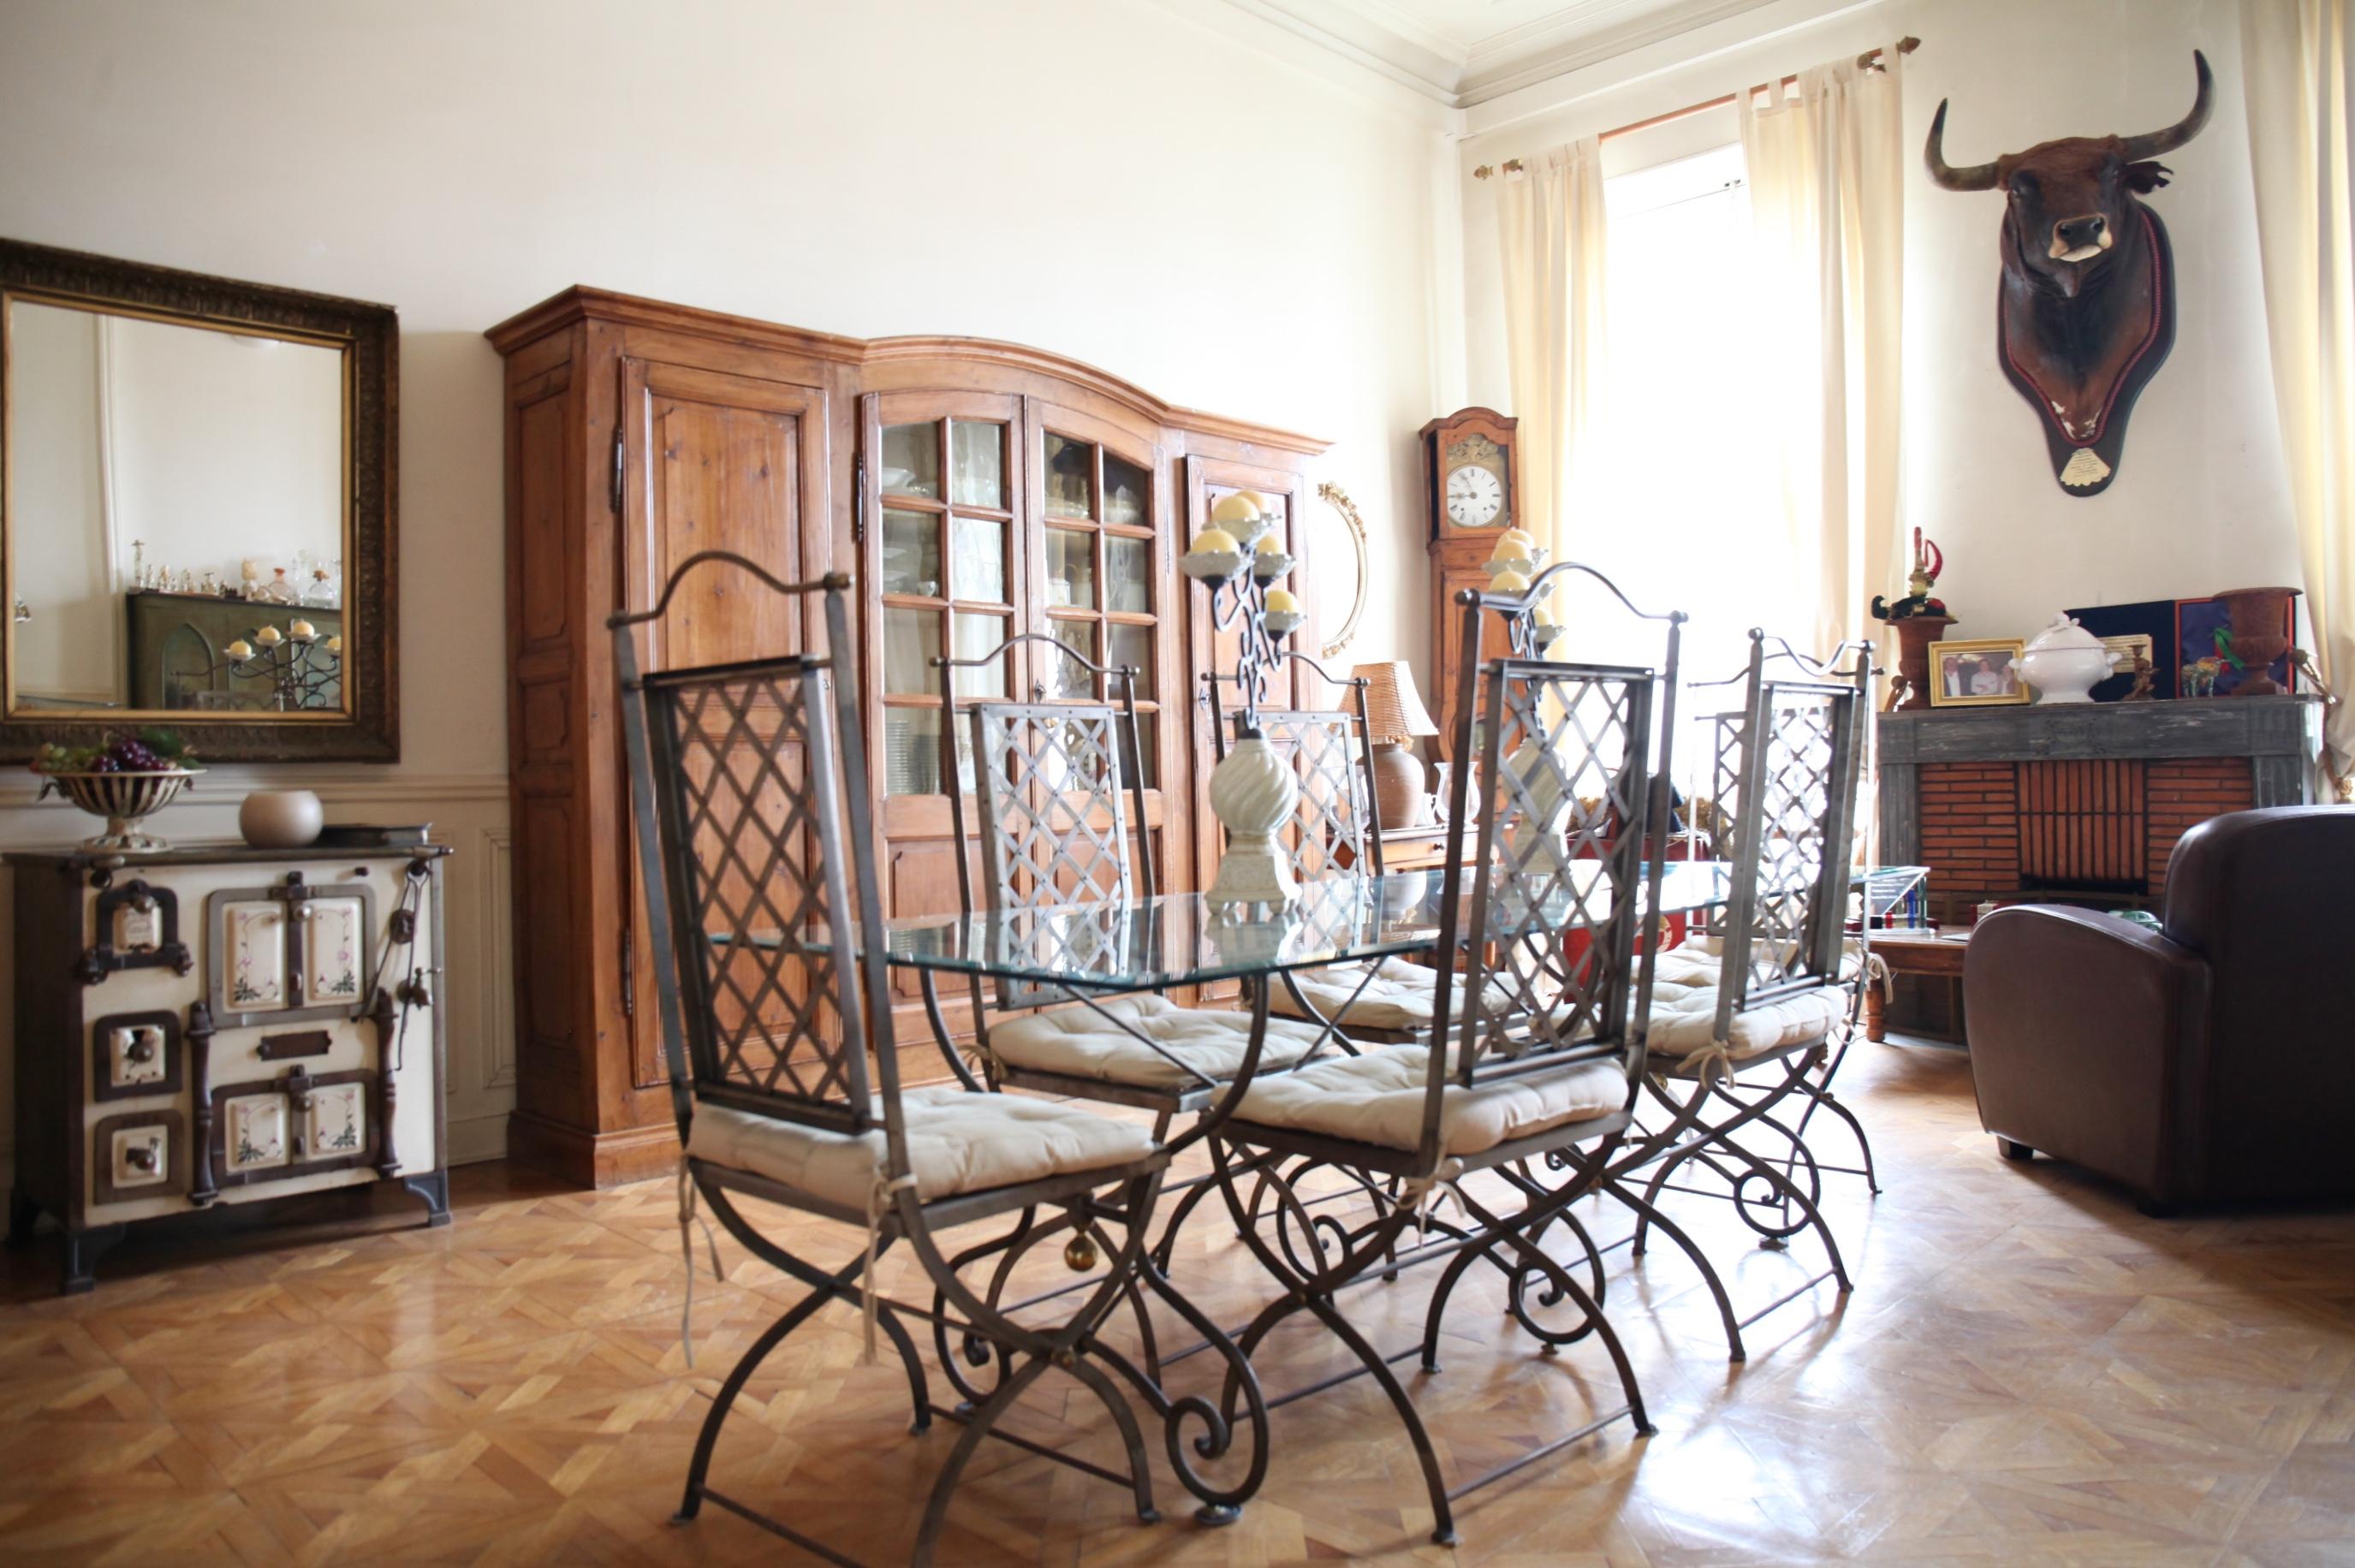 6e - Prefecture/Vauban - Appartement T5/6 - 555 000 €